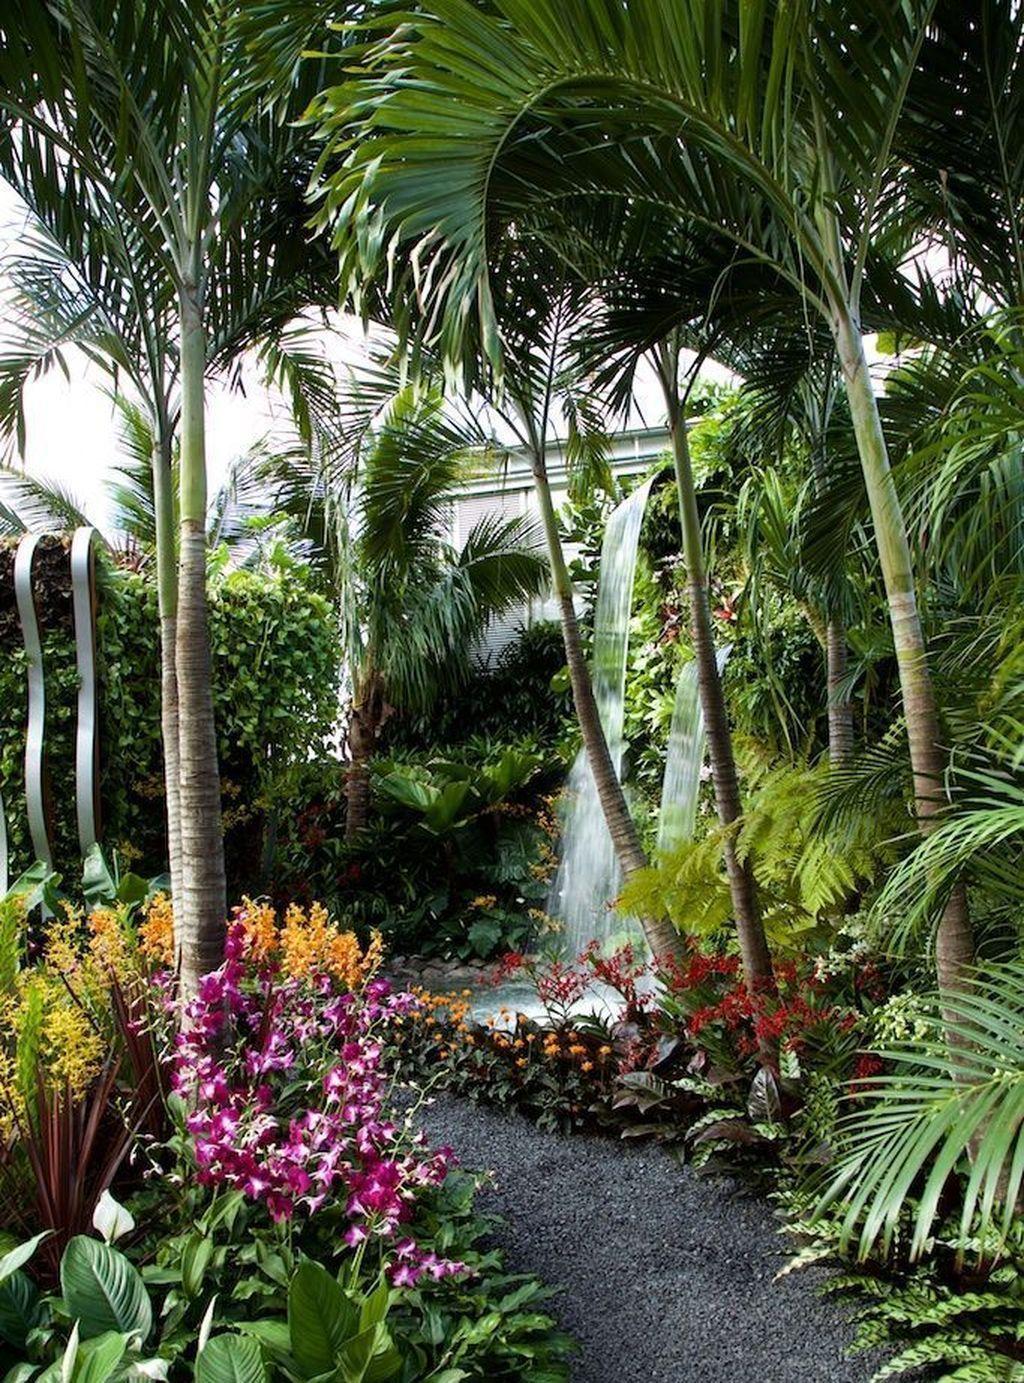 42 Tropical Landscape Designs Ideas | Gardening | Tropical ... on small flower garden ideas, garden flower bed island, landscape berm design ideas, garden bird bath planter,